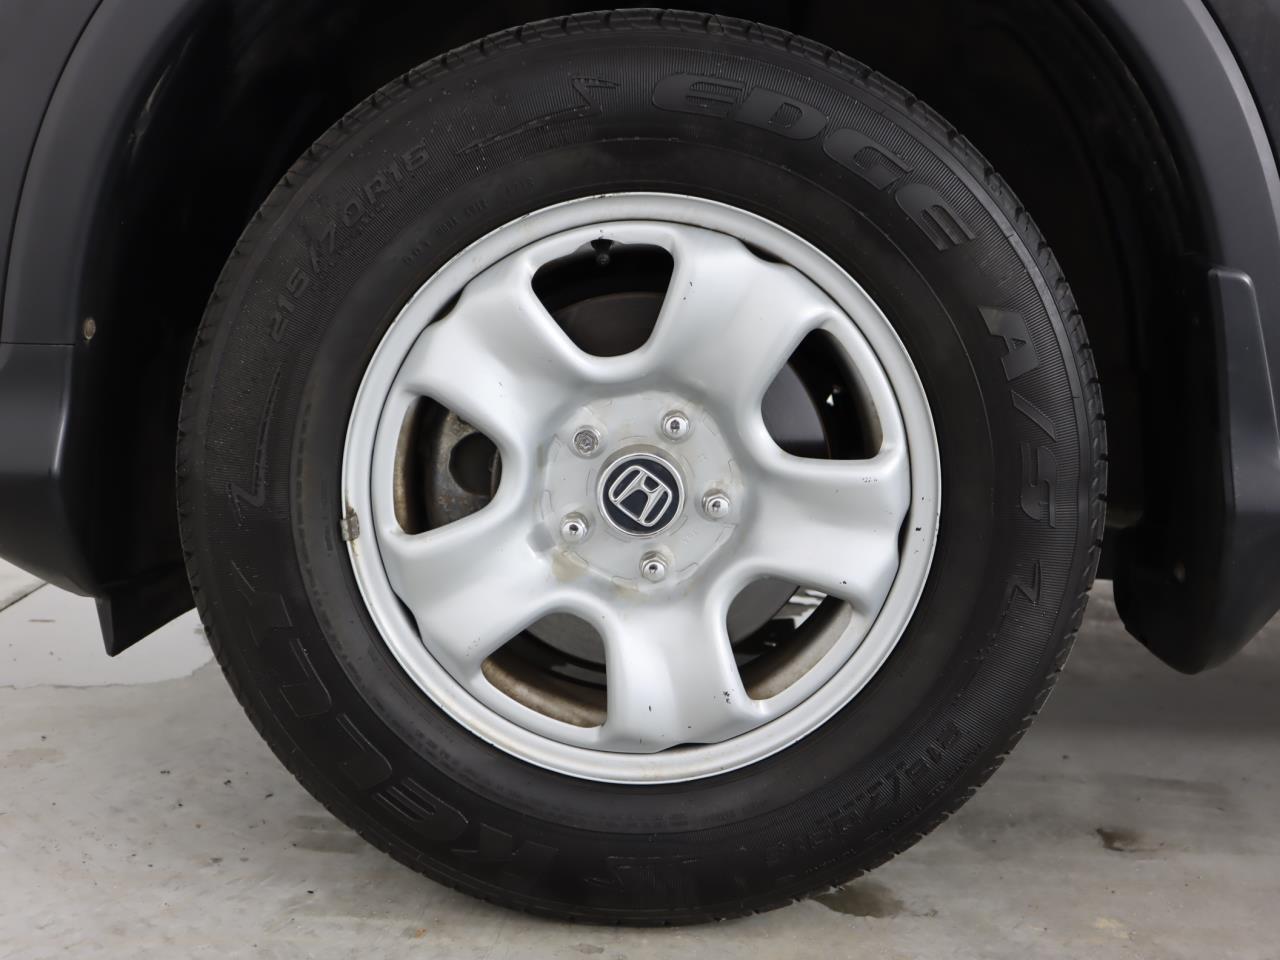 used vehicle - SUV HONDA CR-V 2014